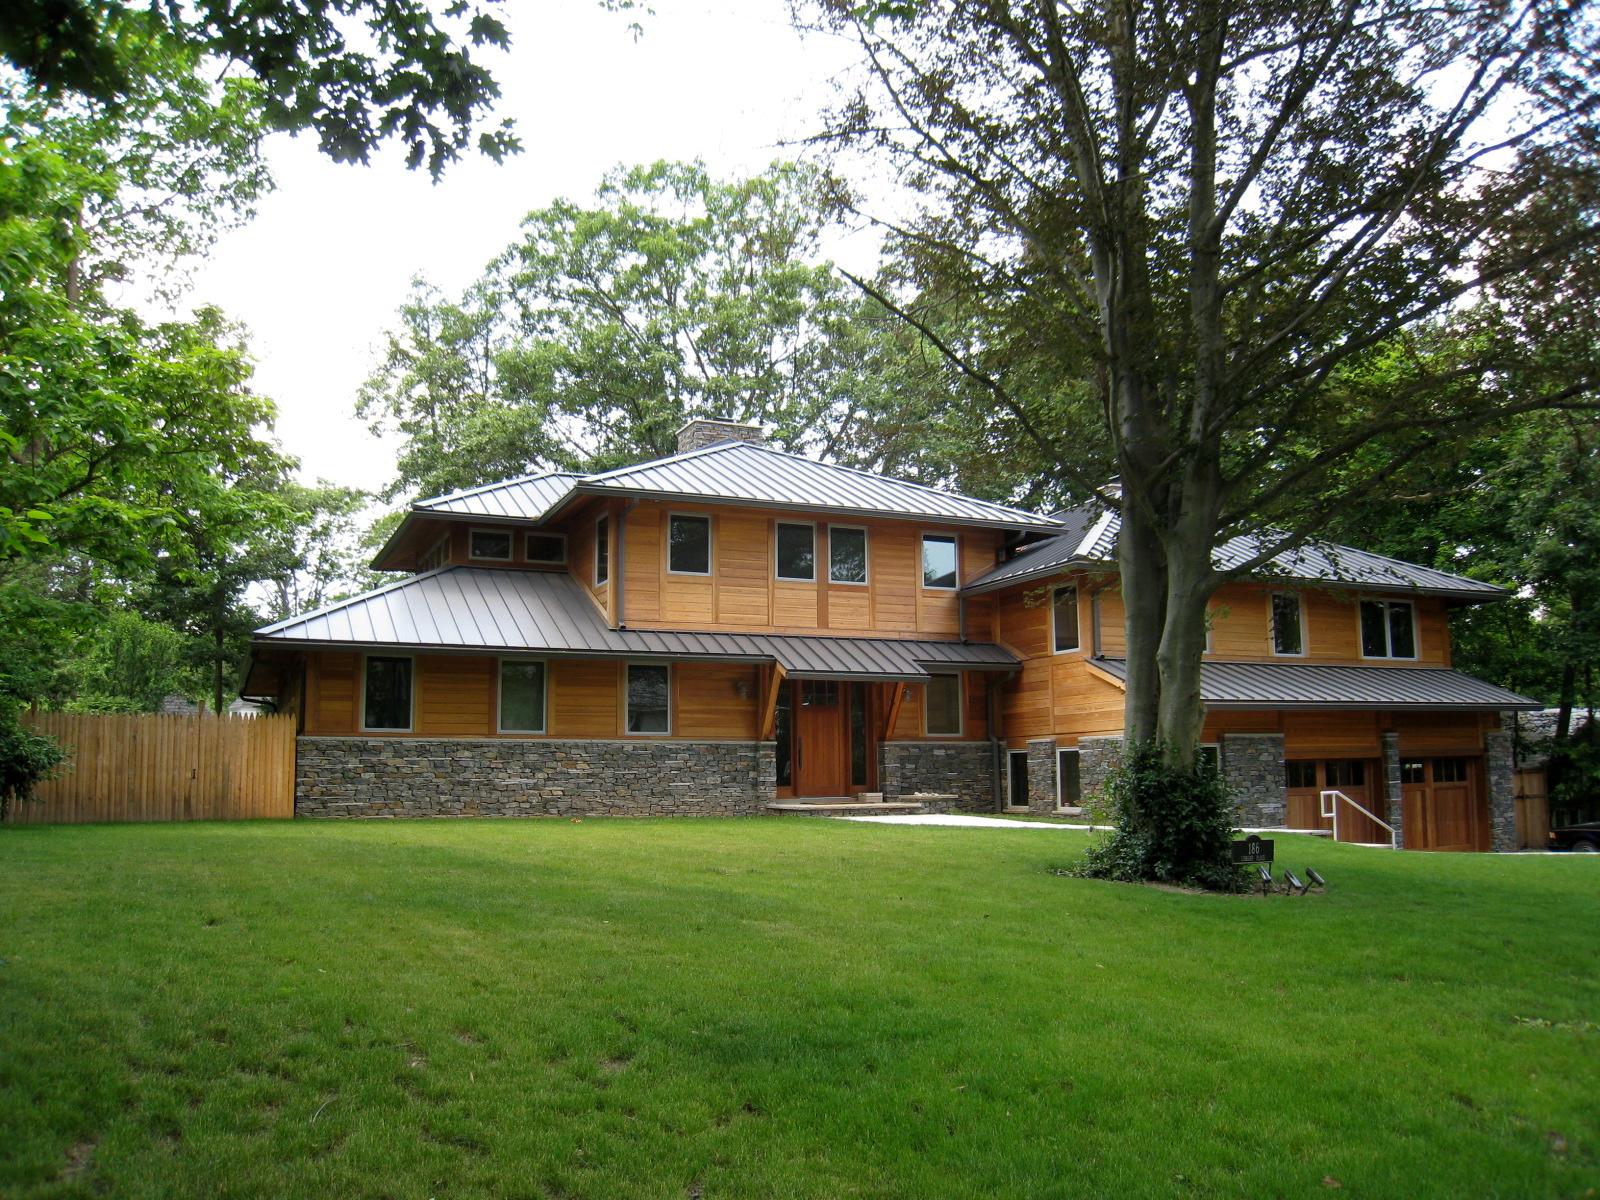 Price Modern Front Wood Siding Stone Base Metal Roof.jpg